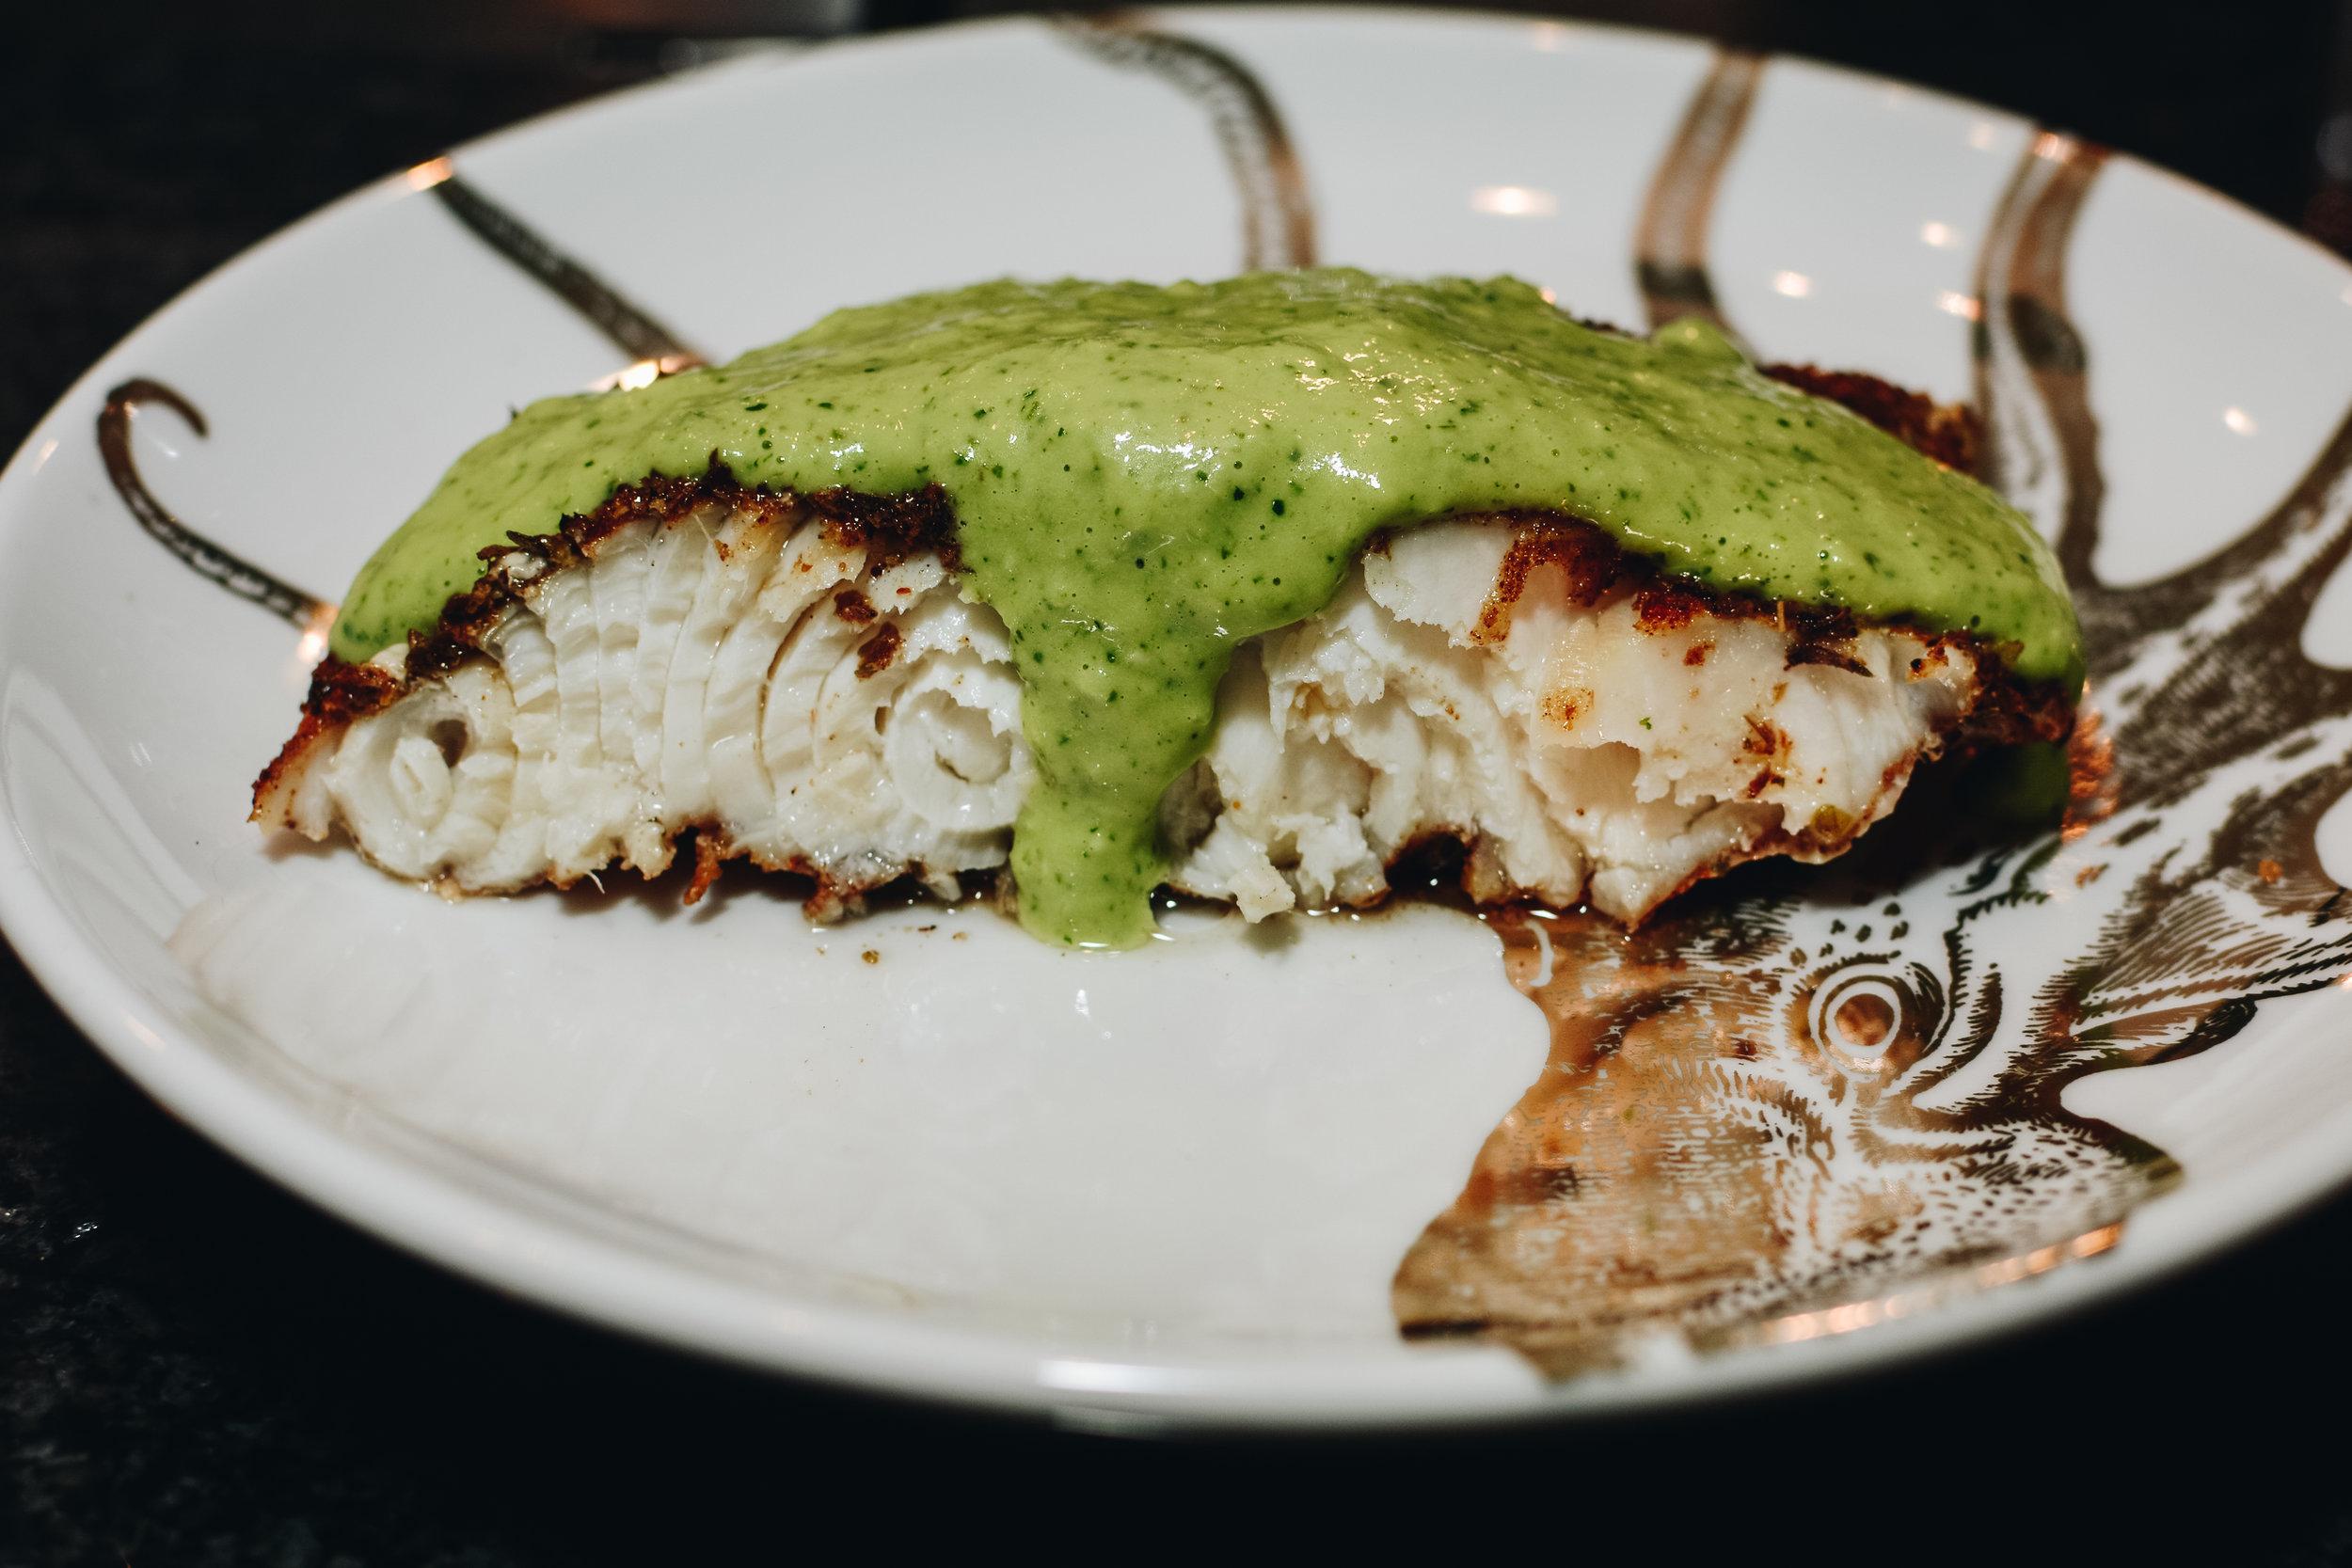 Sturgeon with avocado cream sauce